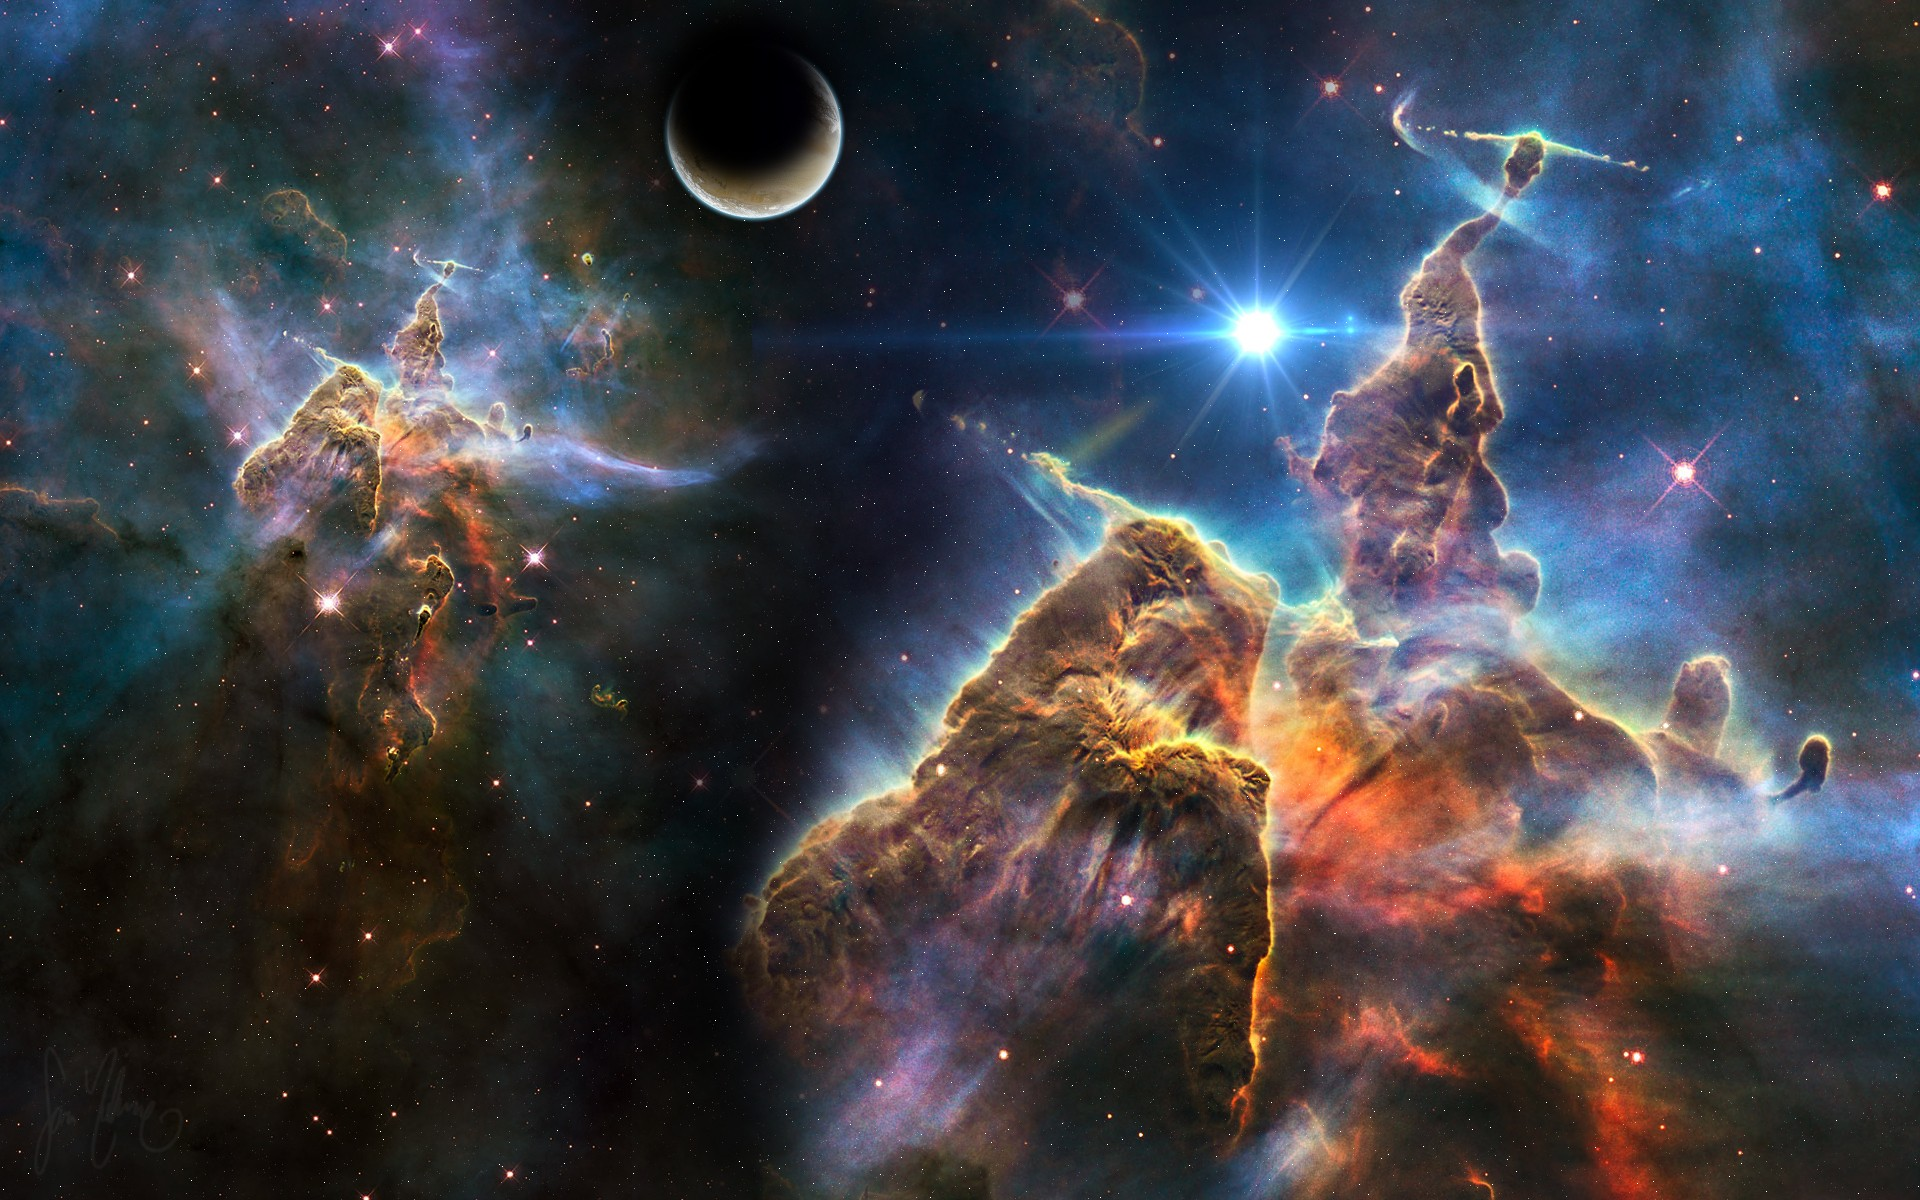 Nebula Full HD Wallpaper And Background Image